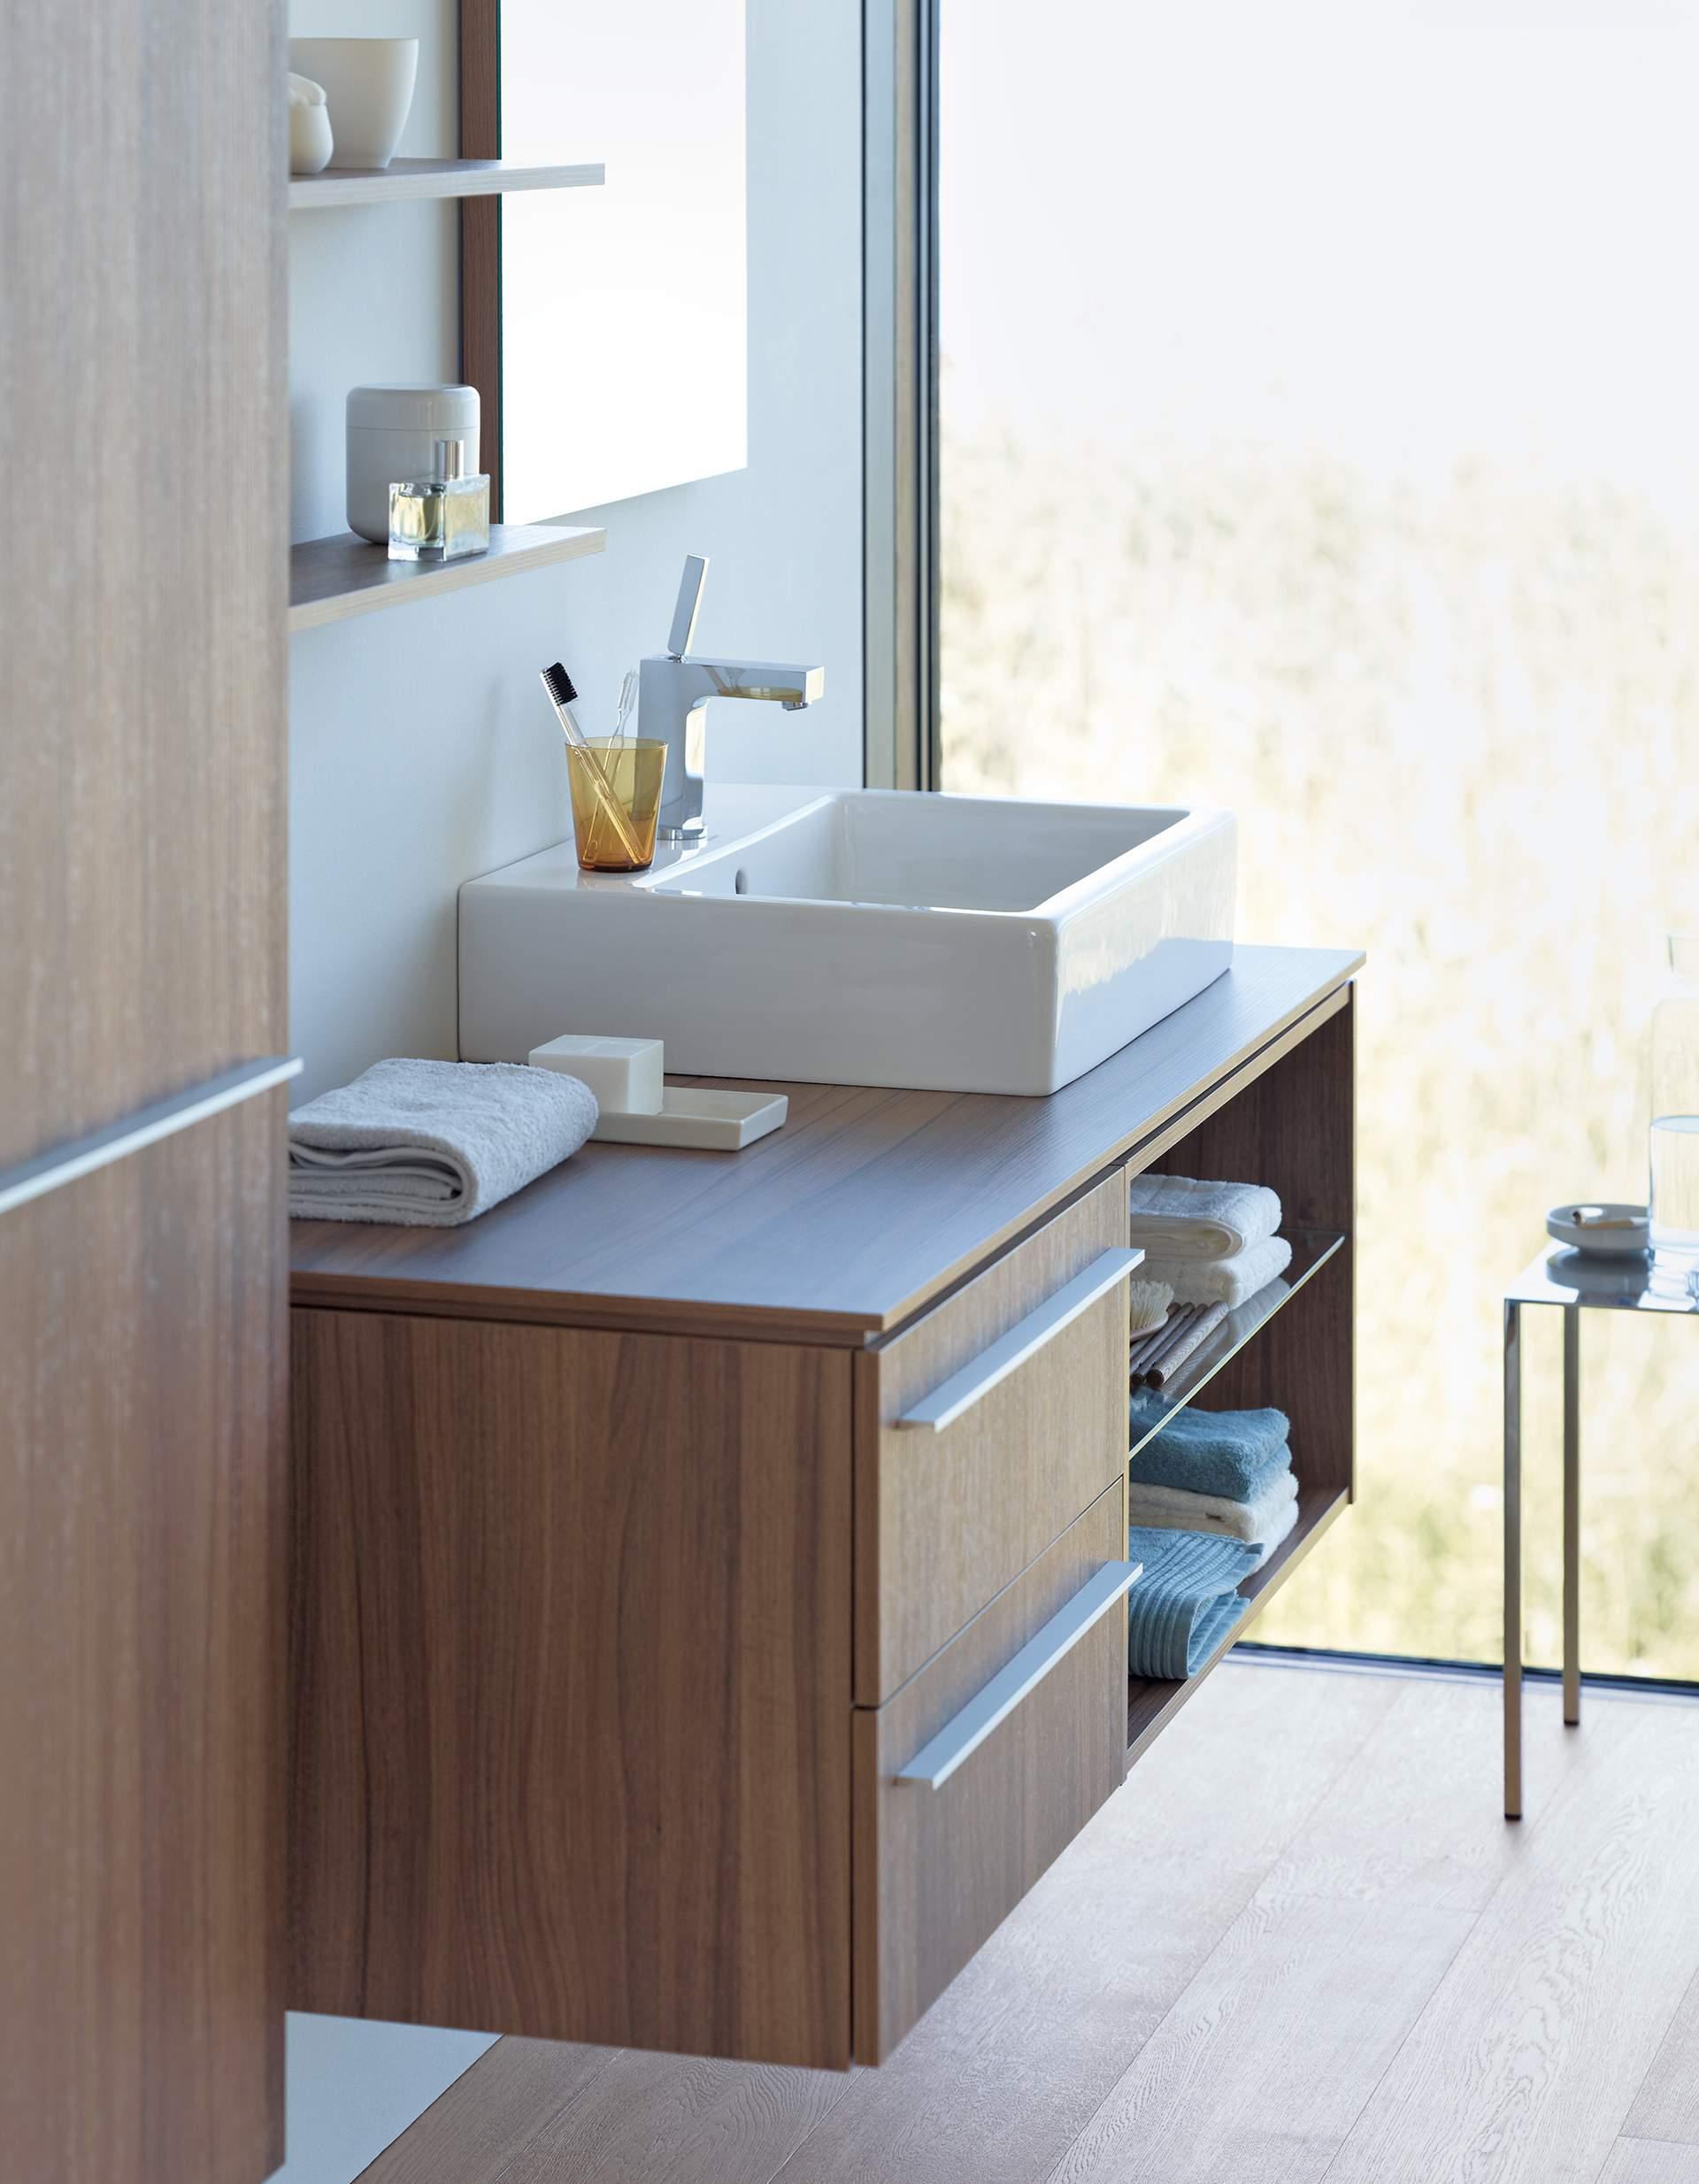 Duravit delos bathroom furniture designed by eoos duravit - Duravit bathroom furniture uk ...